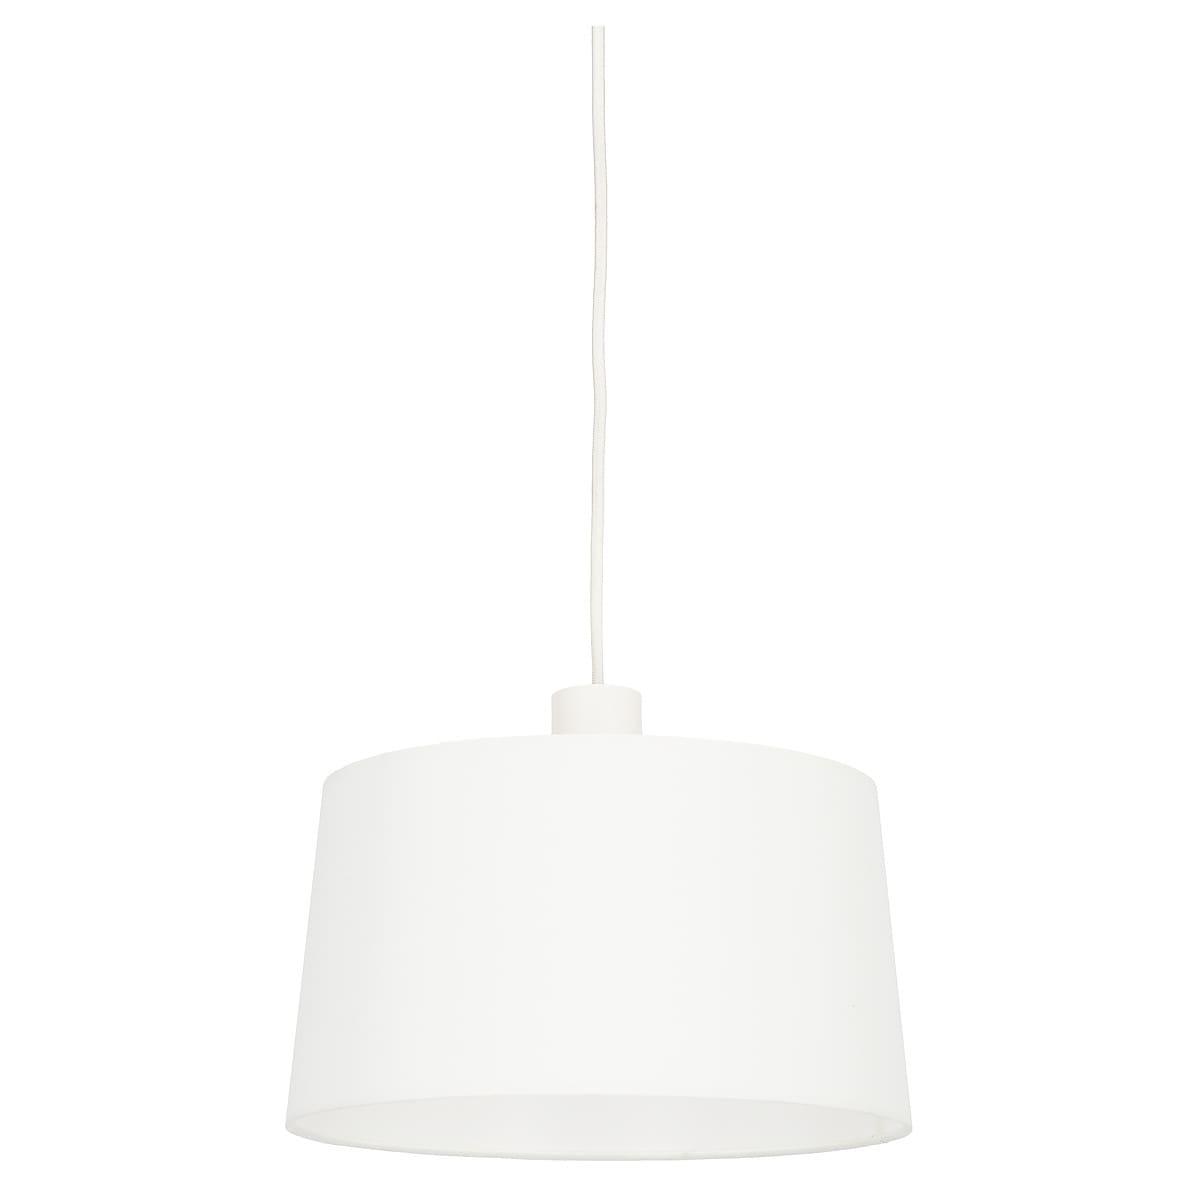 Lampunvarjostin Ø 27 cm Northlight